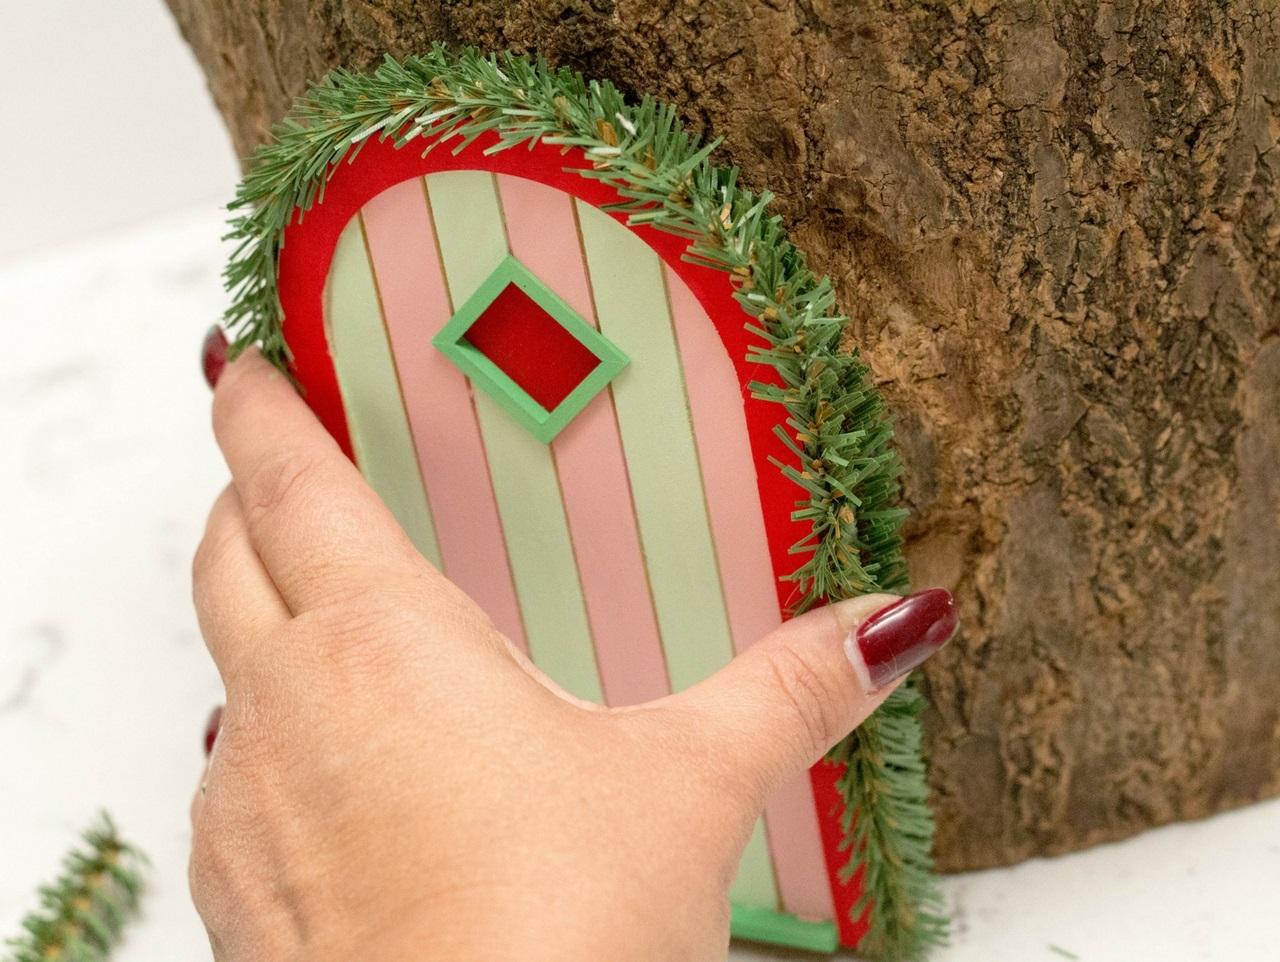 Christmas Fairy House Creation Features Tiny Decorations